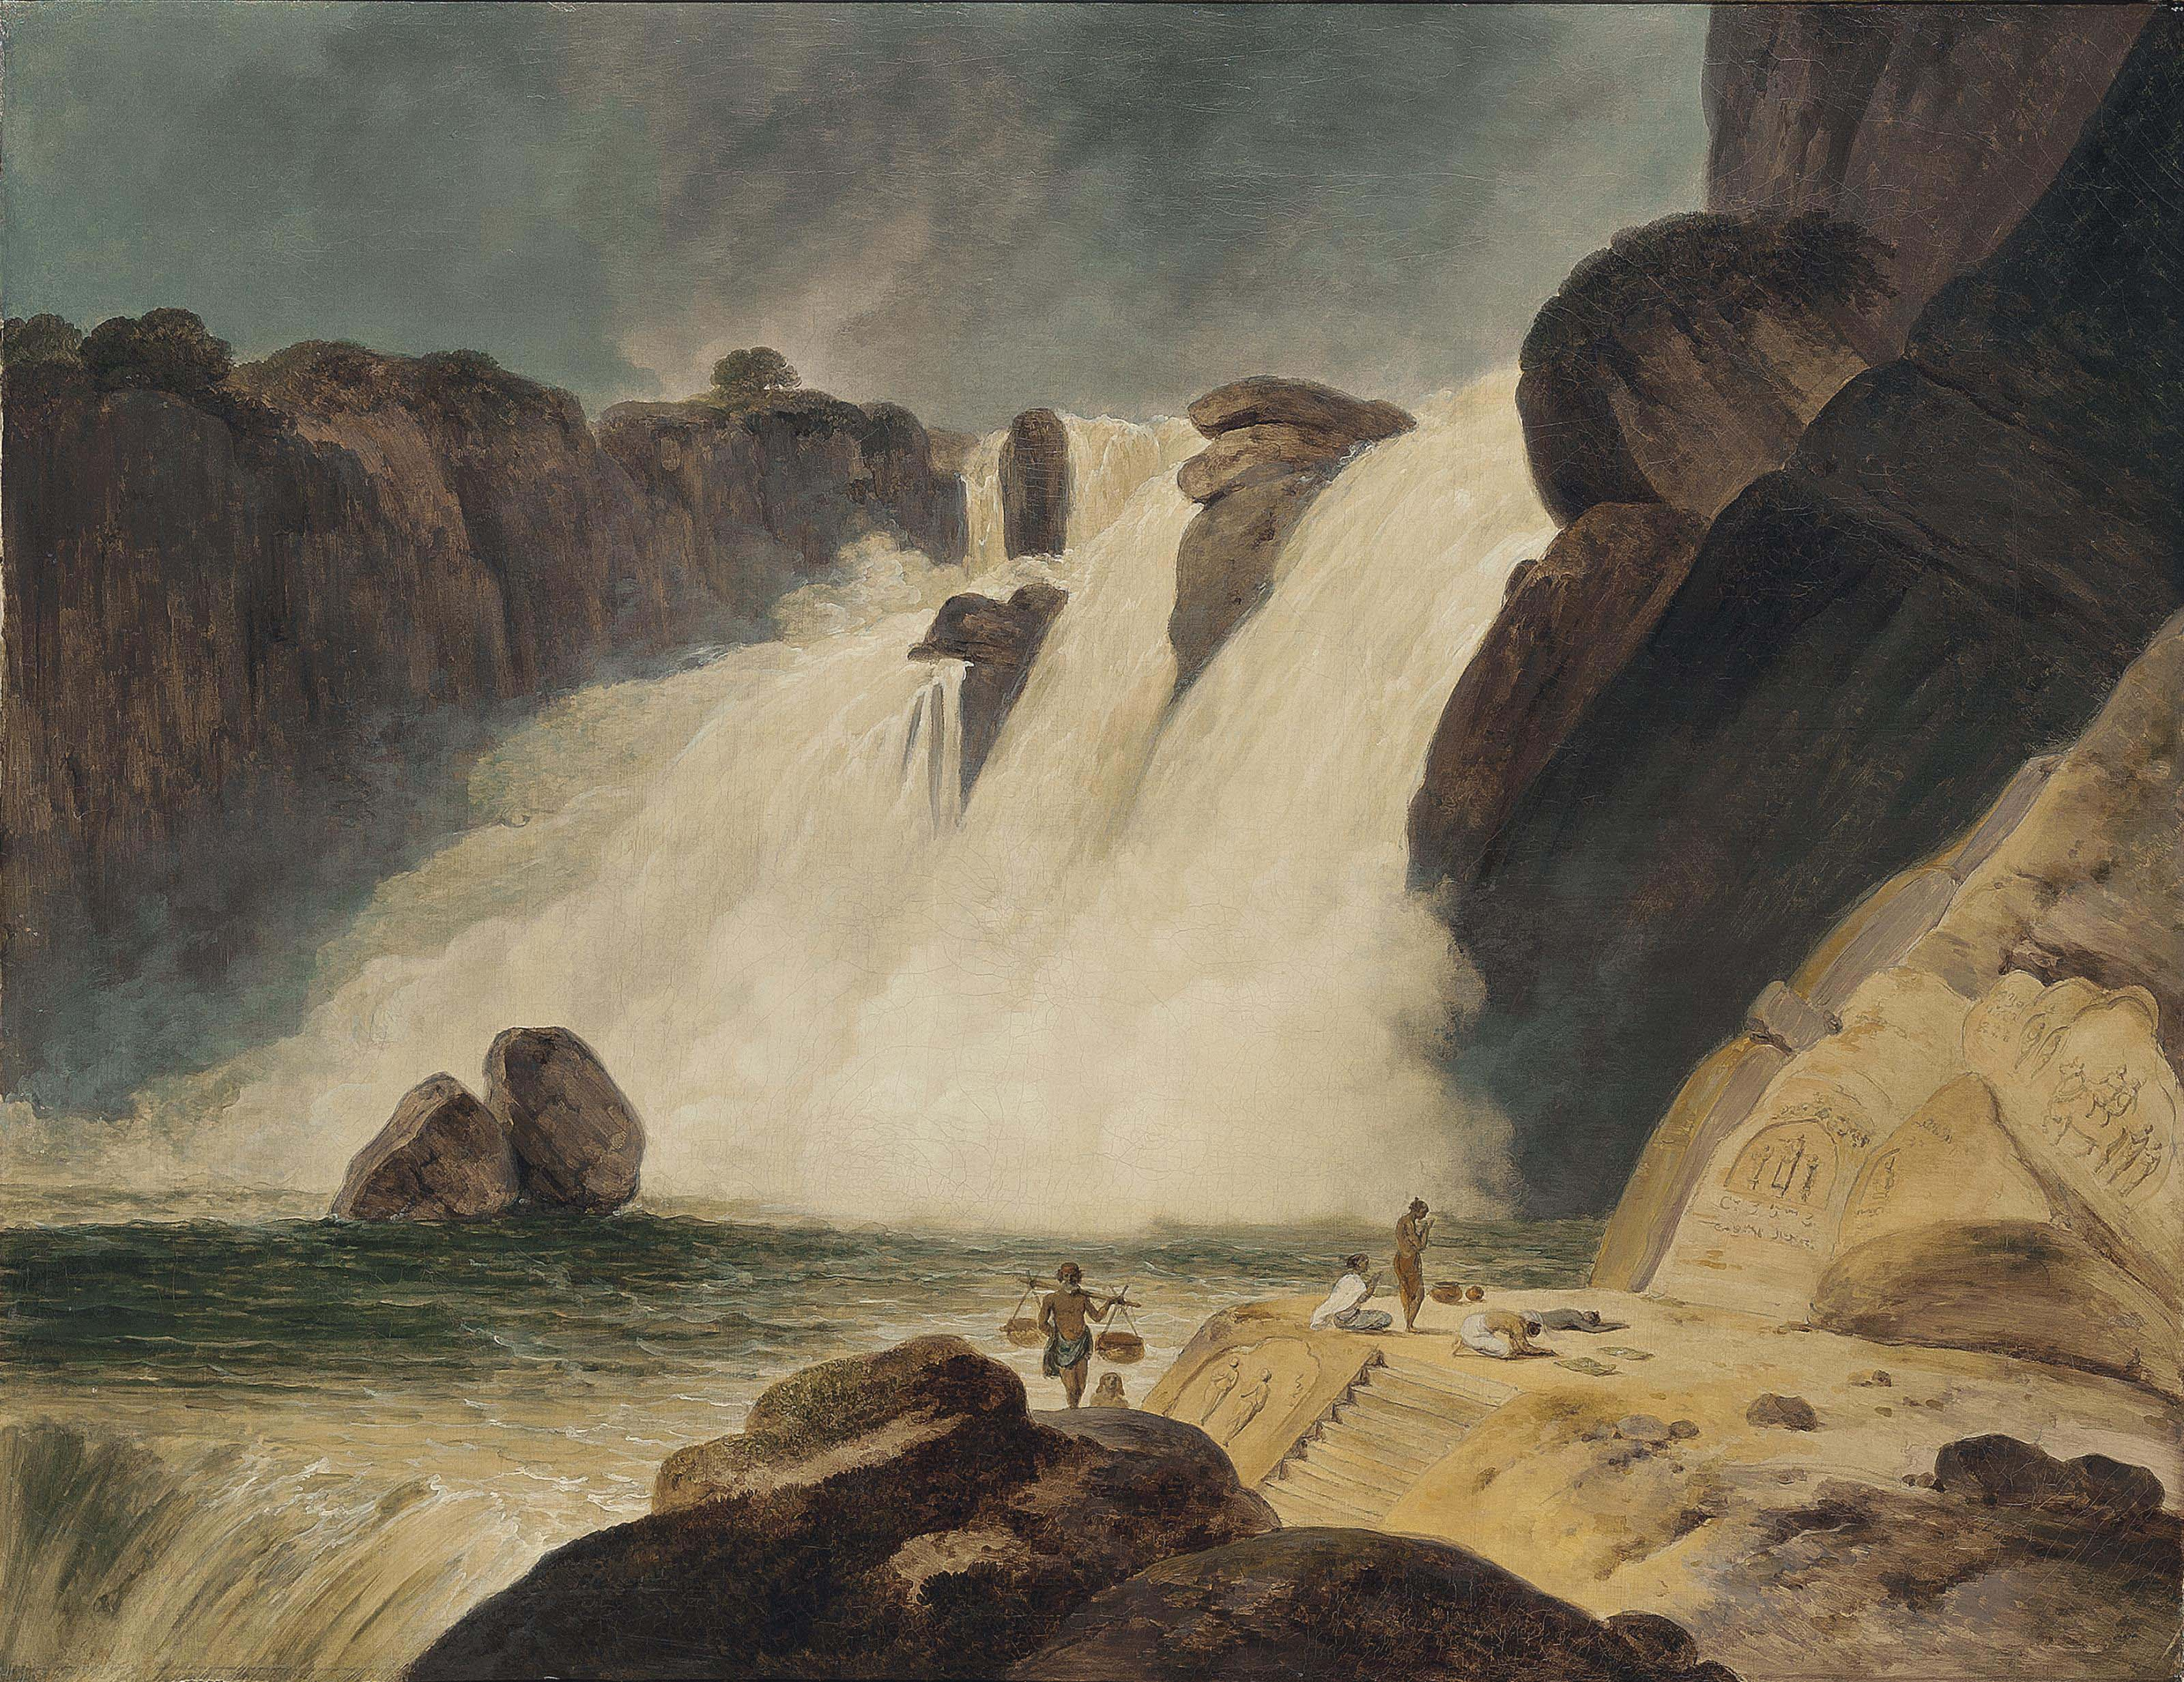 The Waterfall at Papanasam, Tinnevelly District (Tamil Nadu)